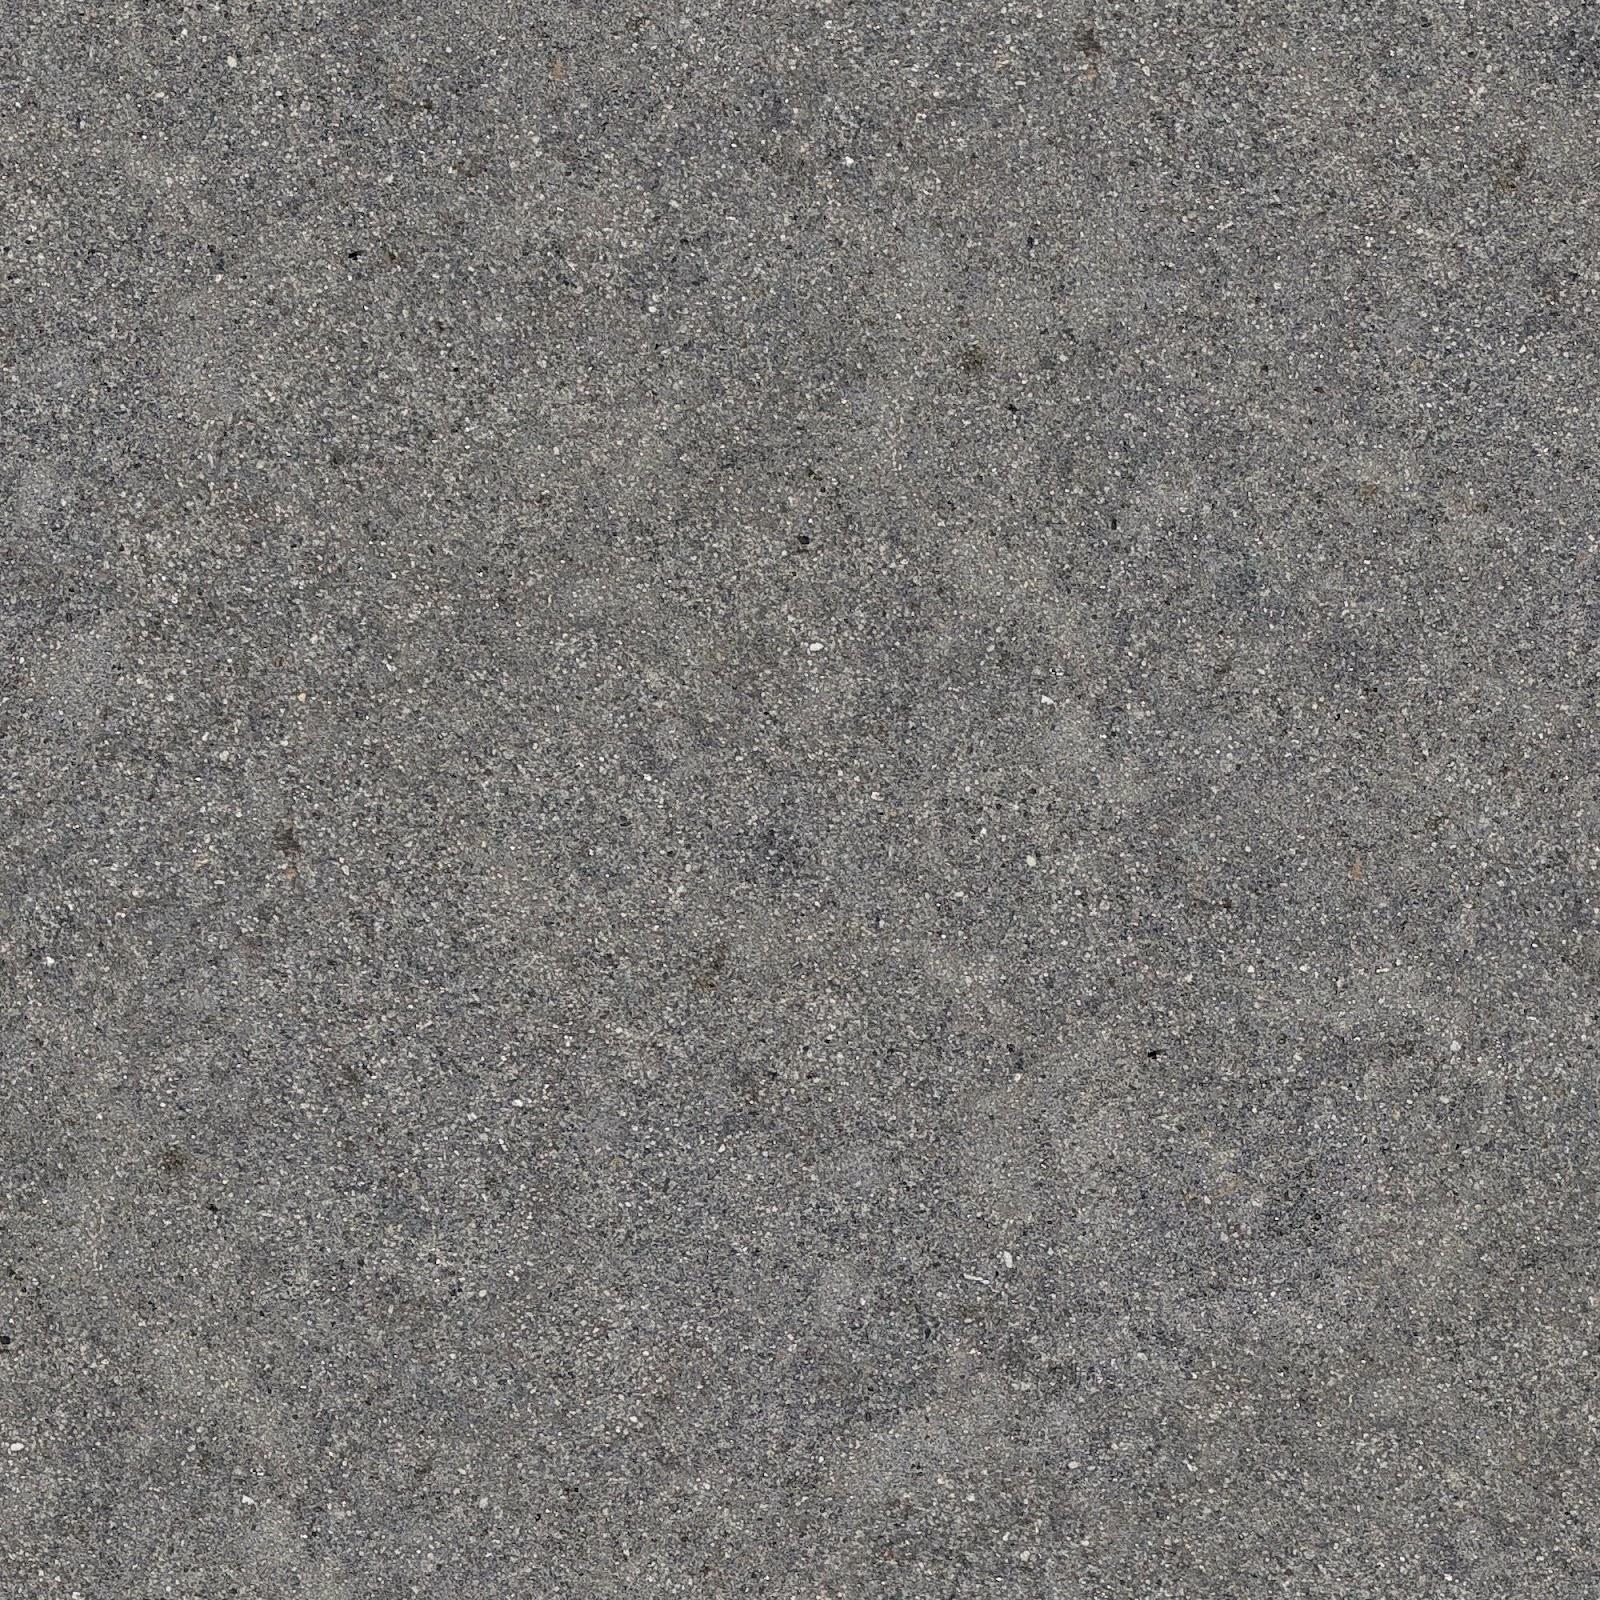 High Resolution Seamless Textures: Free Seamless Concrete Textures